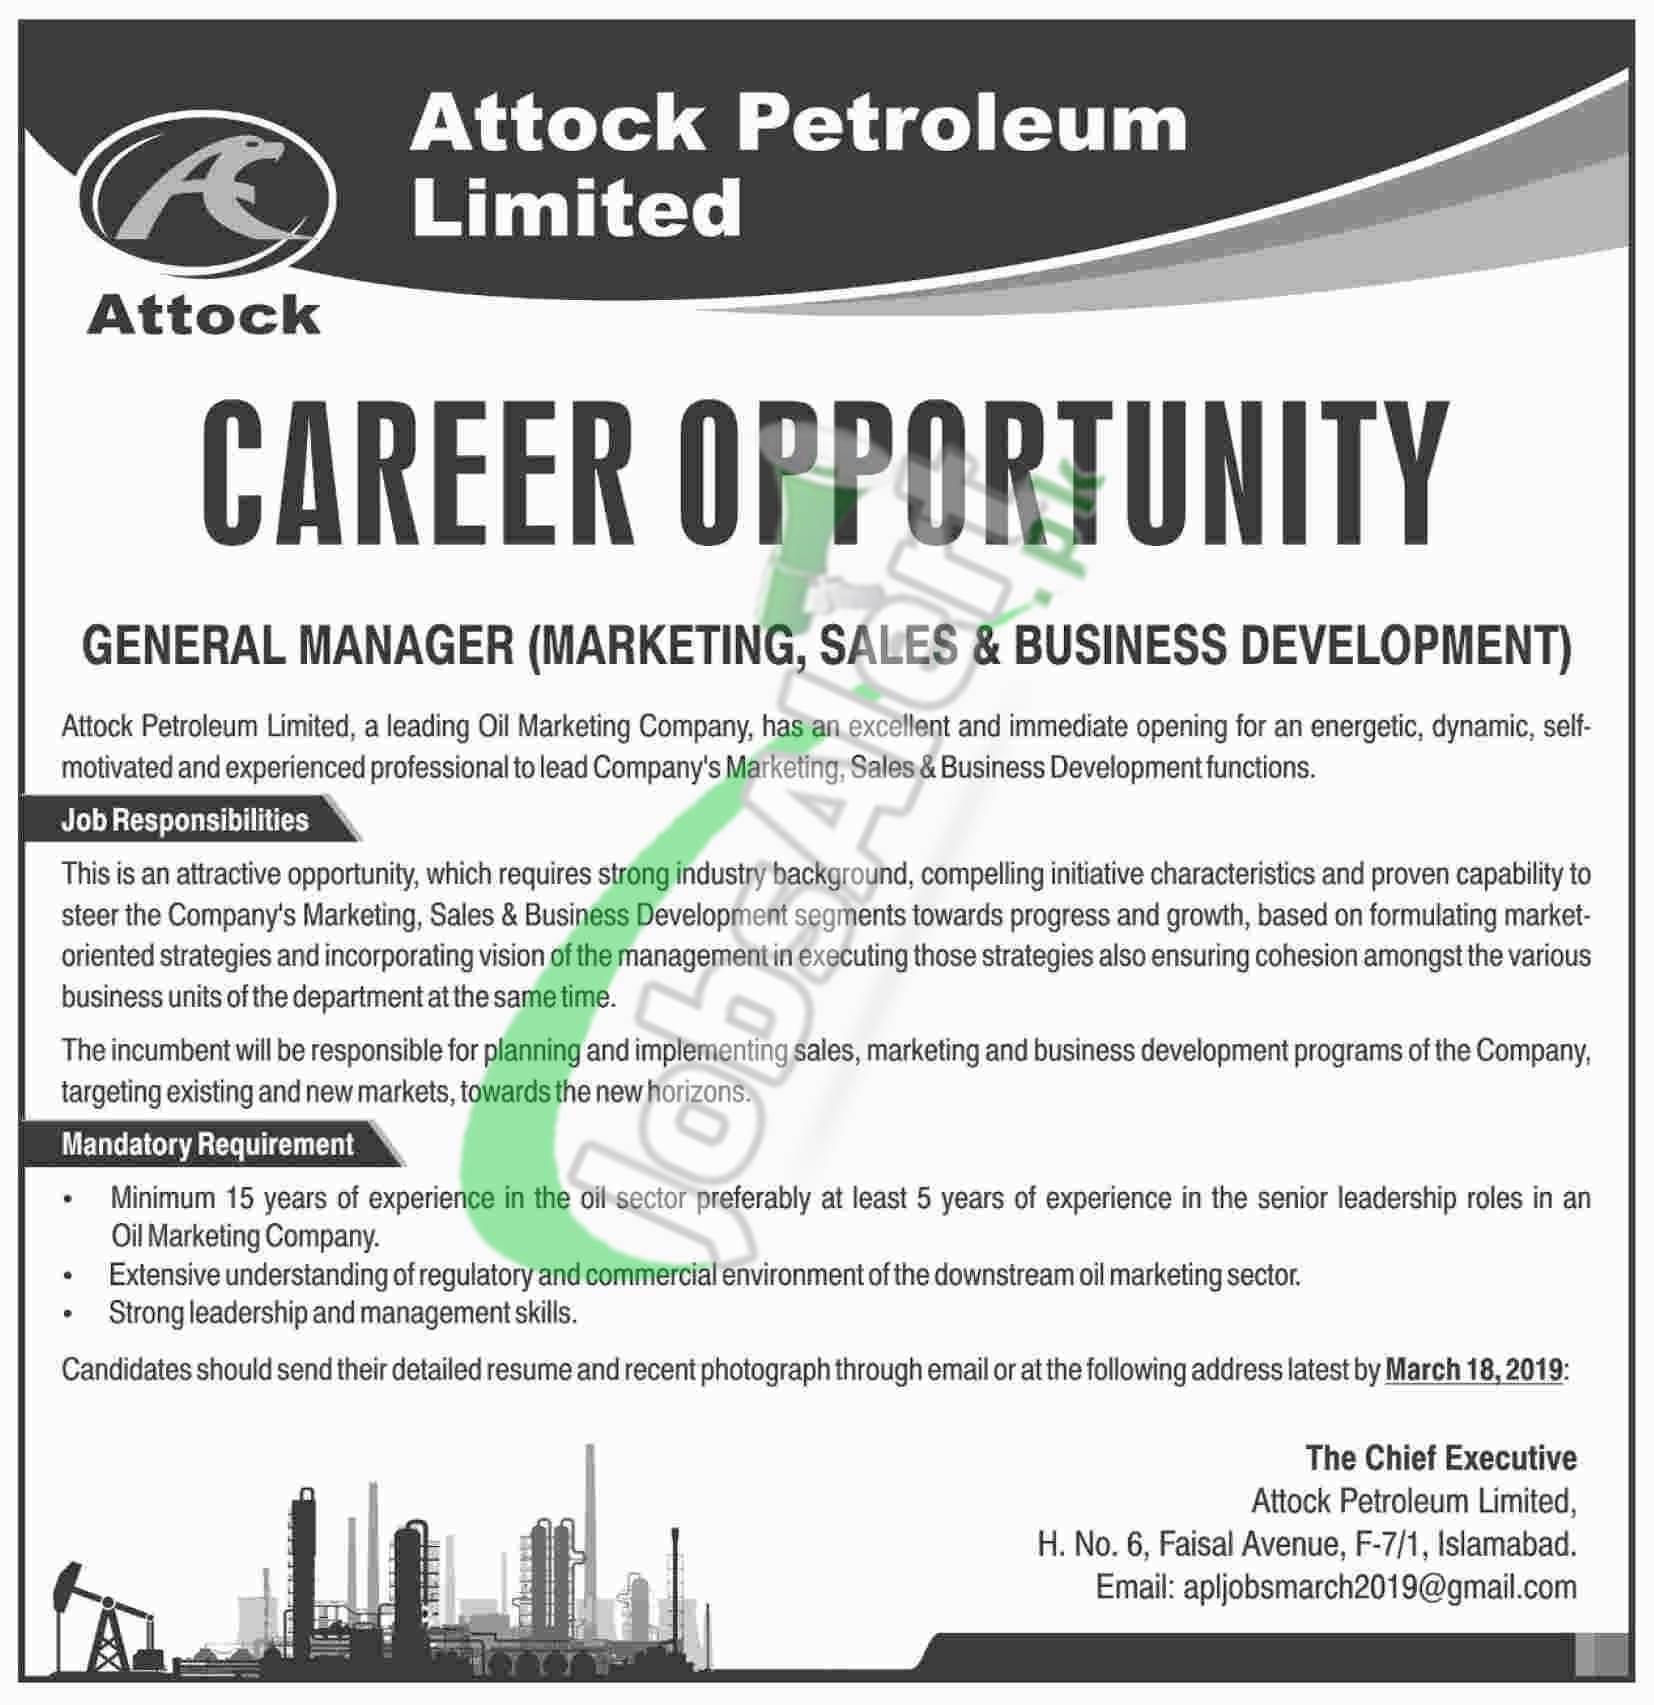 Attock Petroleum Limited Jobs